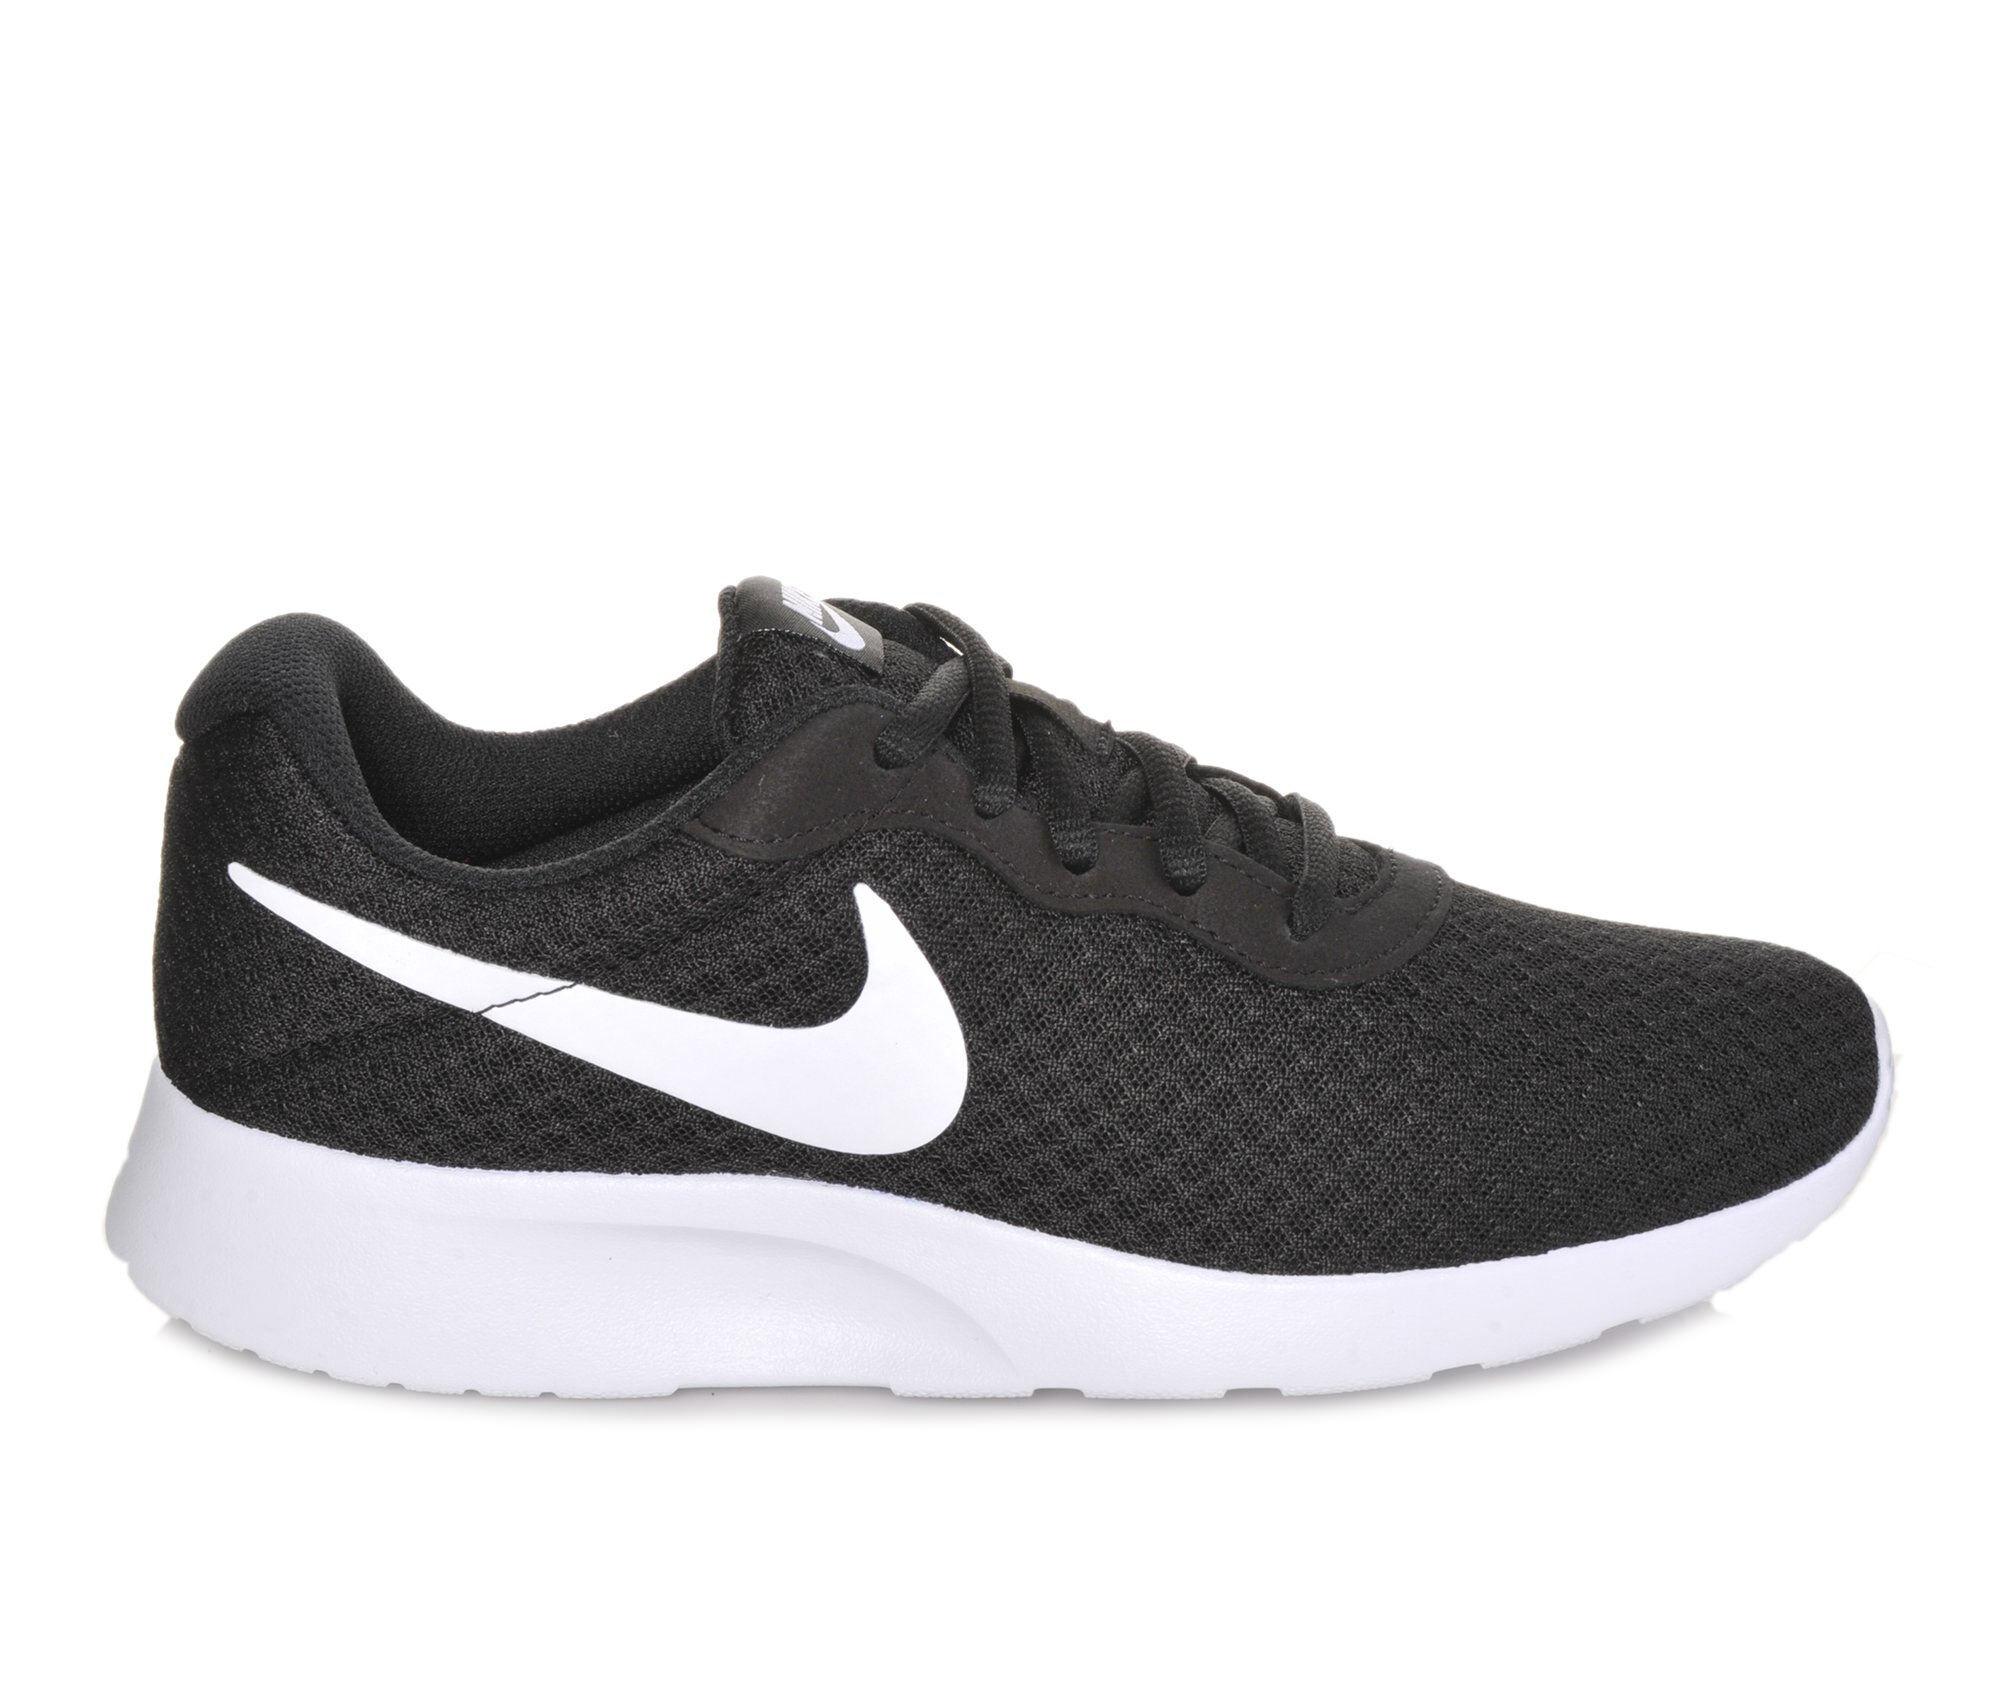 Women's Nike Tanjun Sneakers Black/White